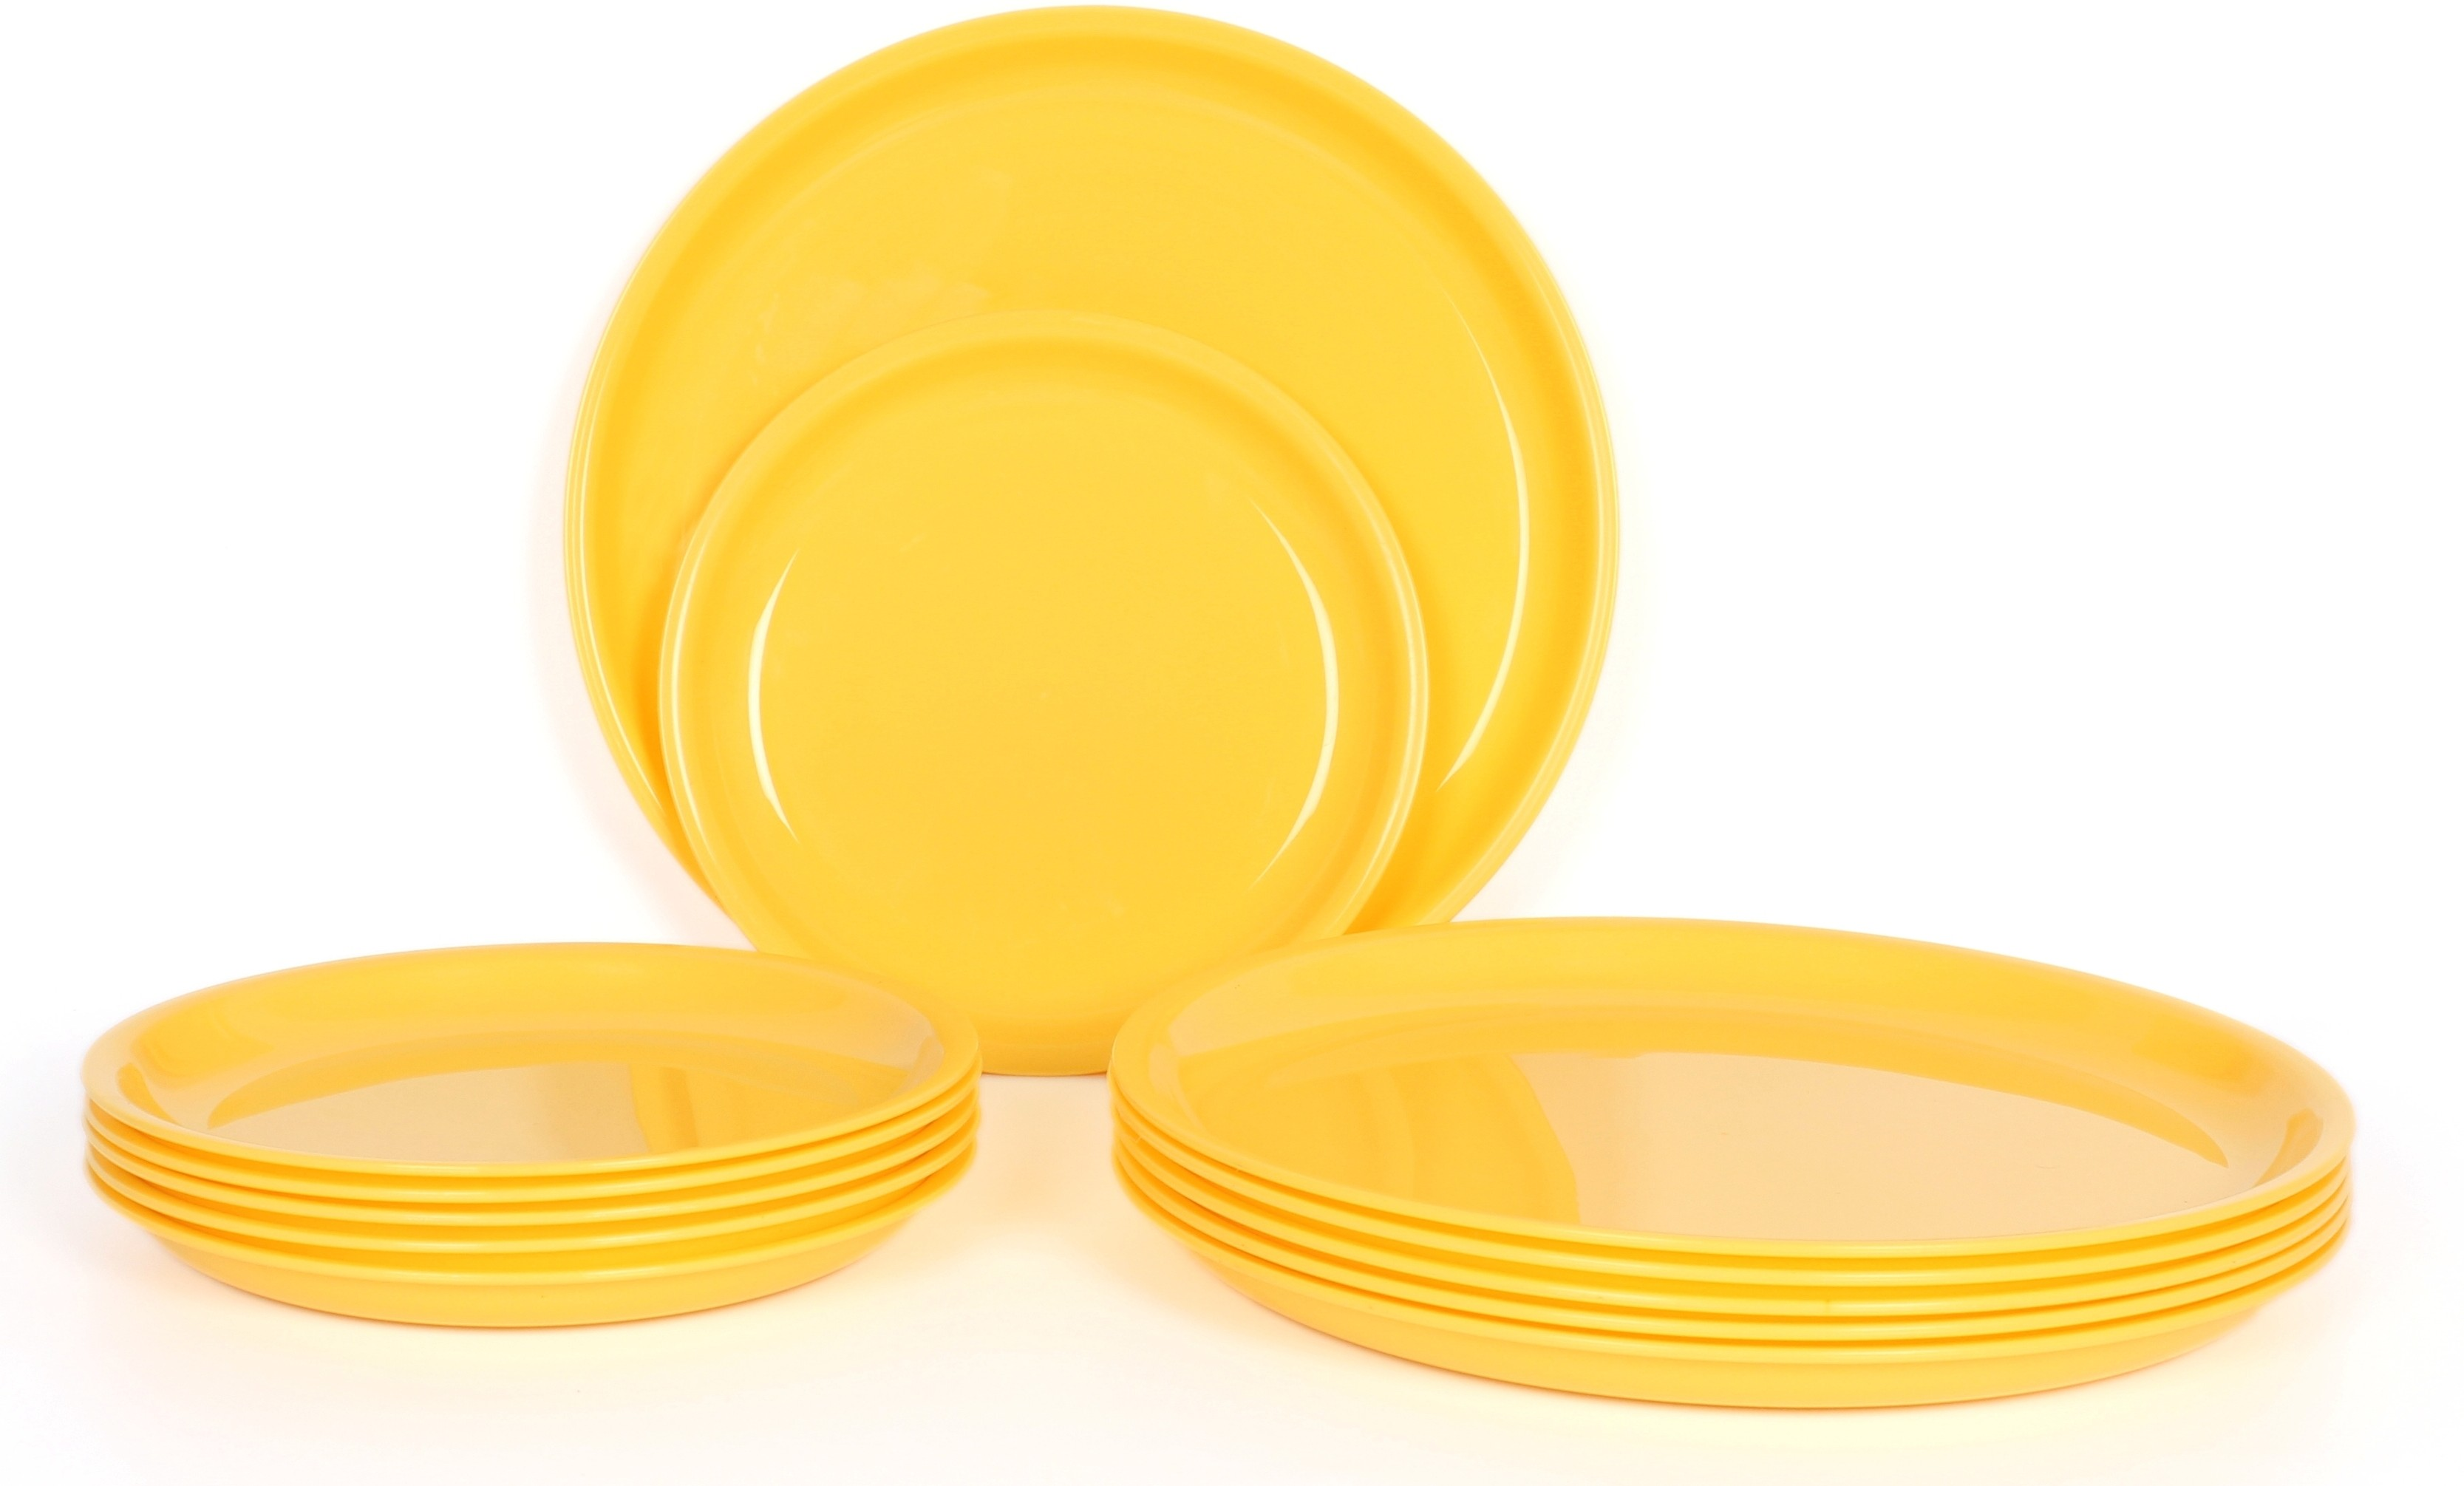 Gluman Microwave Safe Round Solid Plastic Plate Set